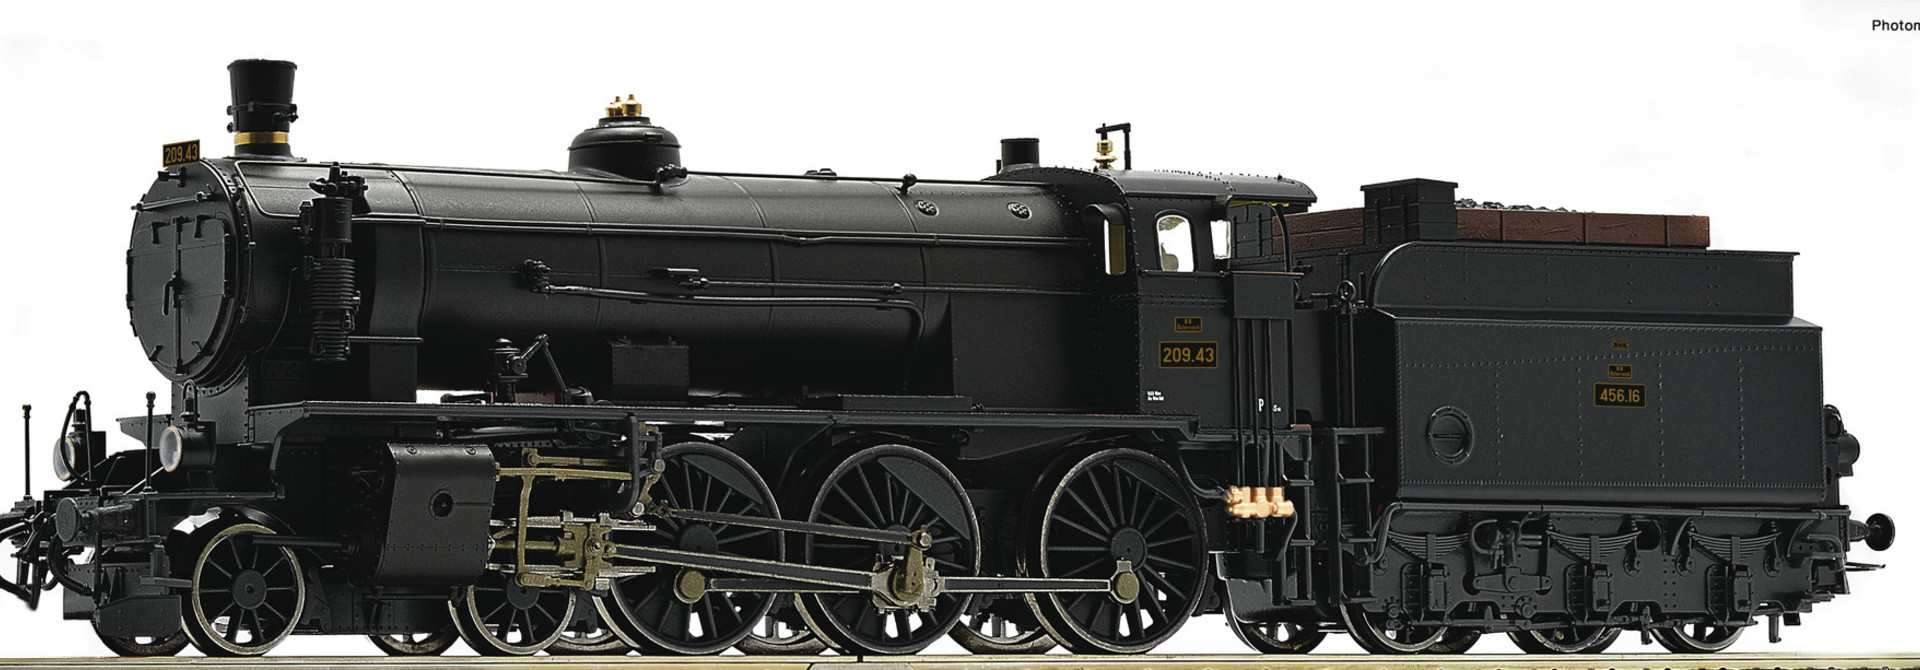 72108 Dampflok Rh 209 BBÖ